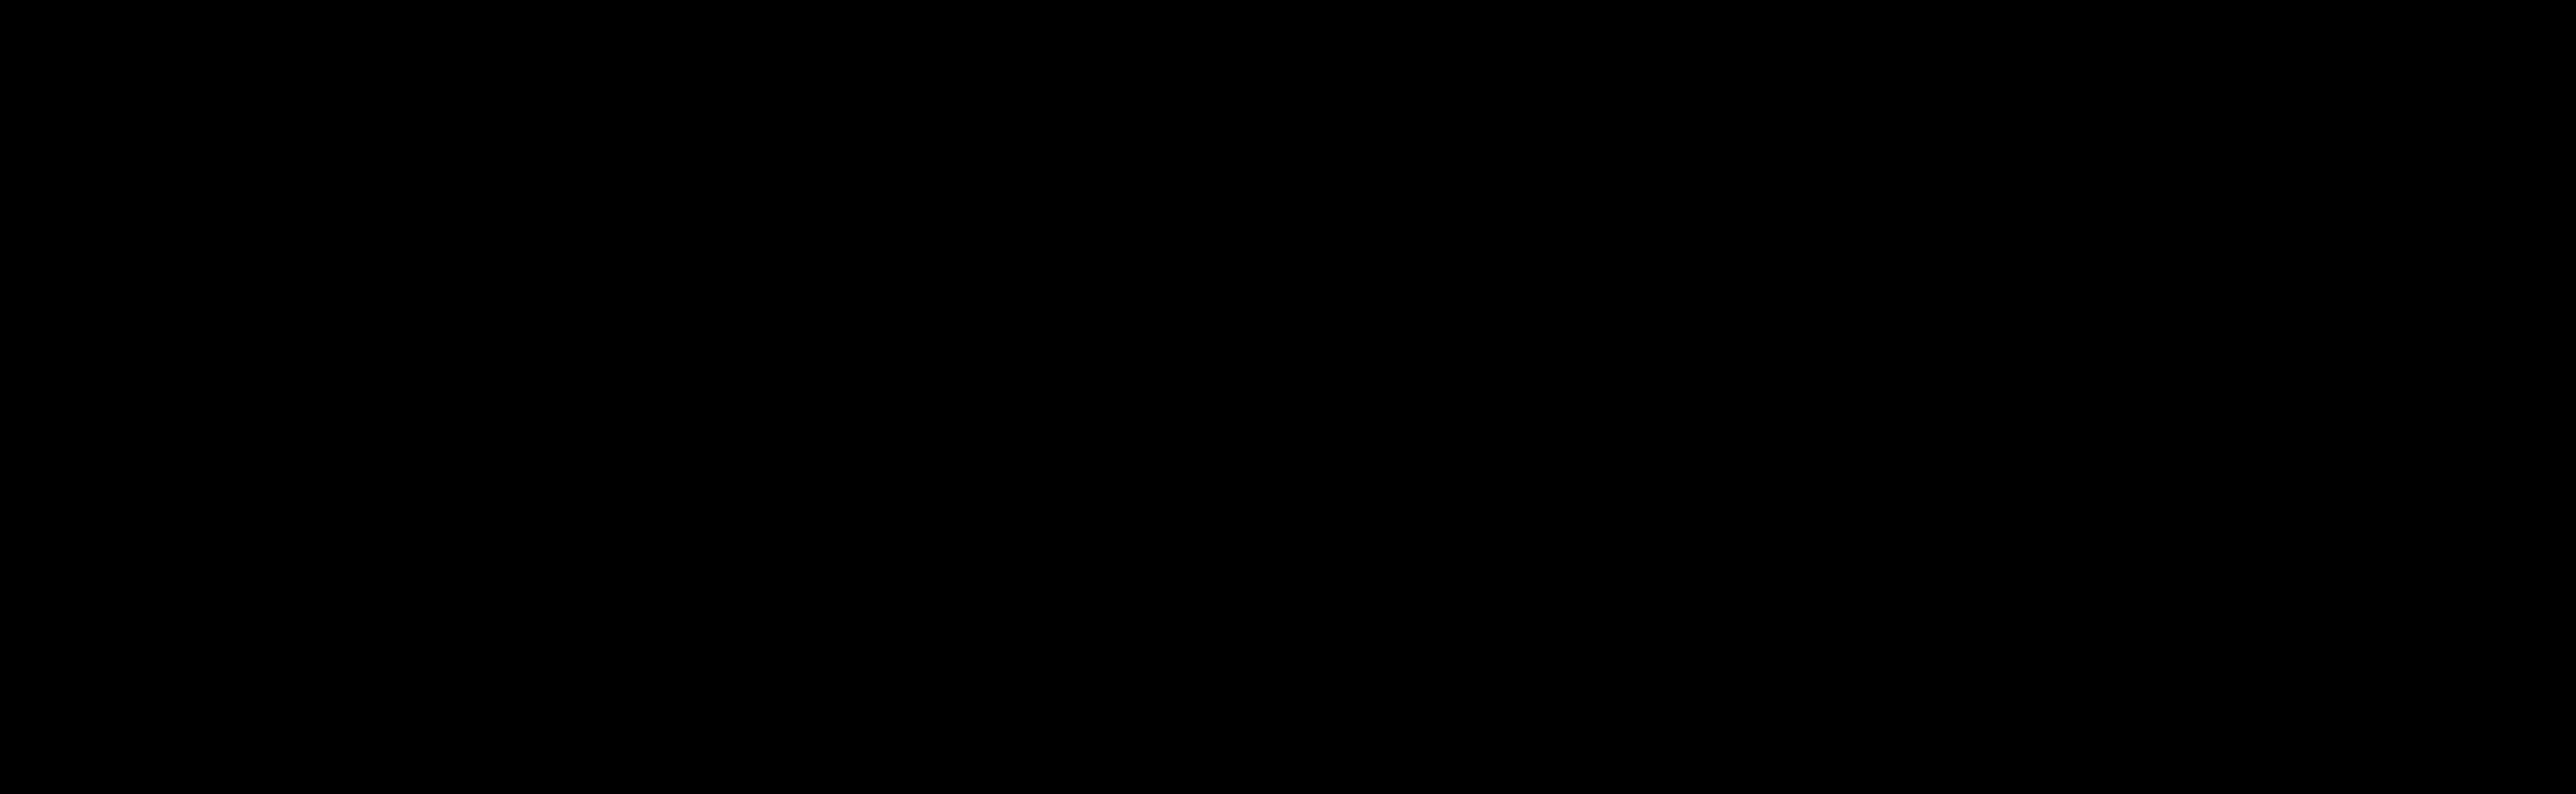 NC-9 <sup>13</sup>C<sub>2</sub>